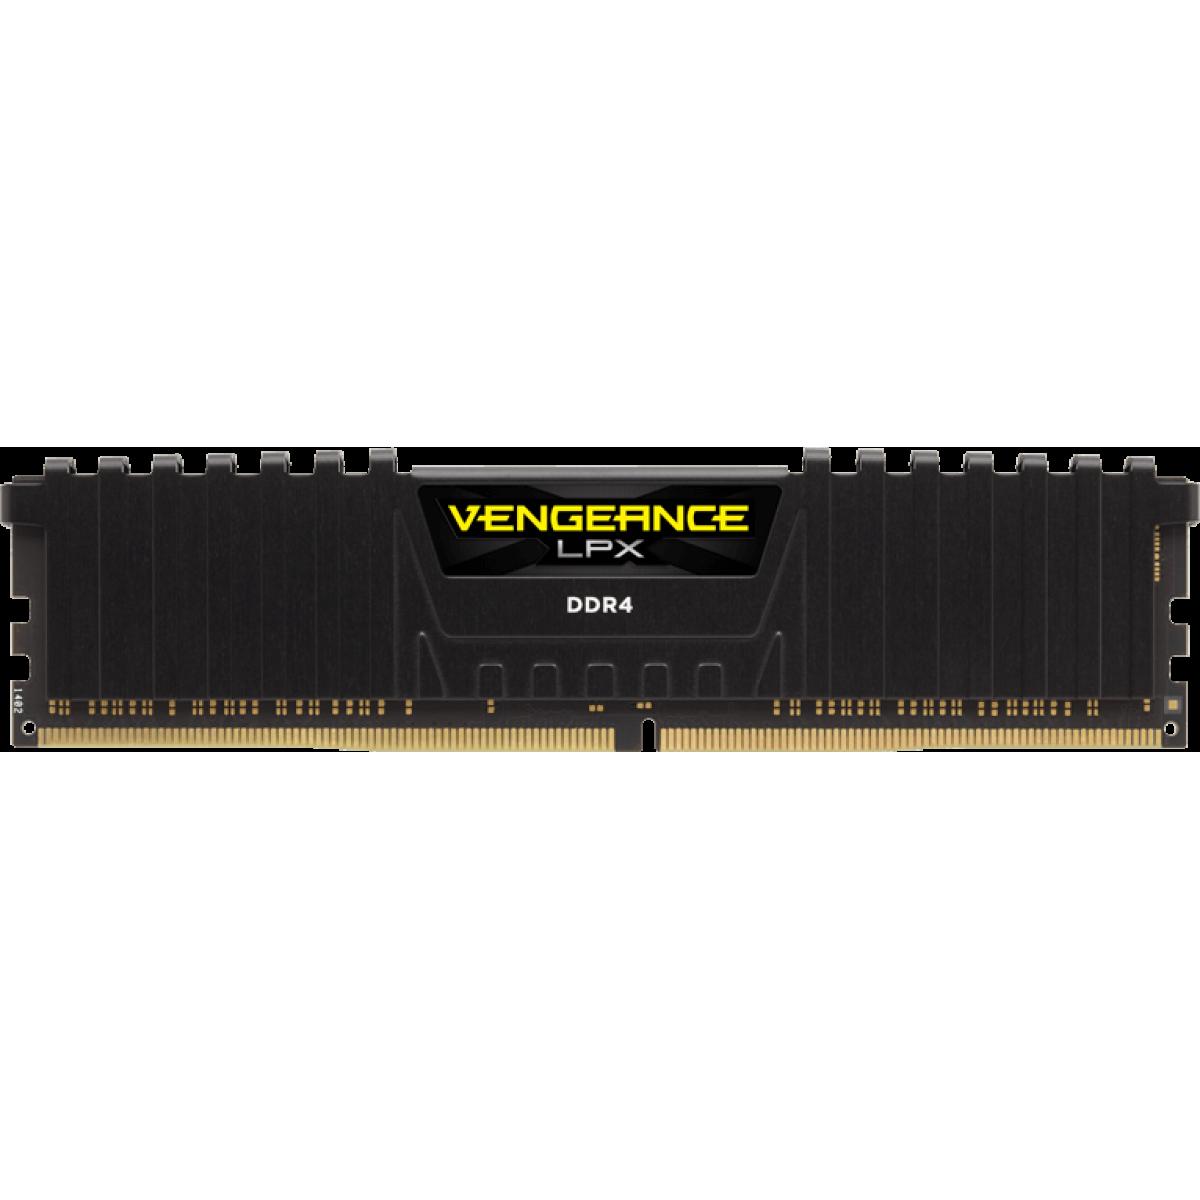 Memória DDR4 Corsair Vengeance LPX, 32GB (2X16GB) 3000Mhz, CMK32GX4M2B3000C15